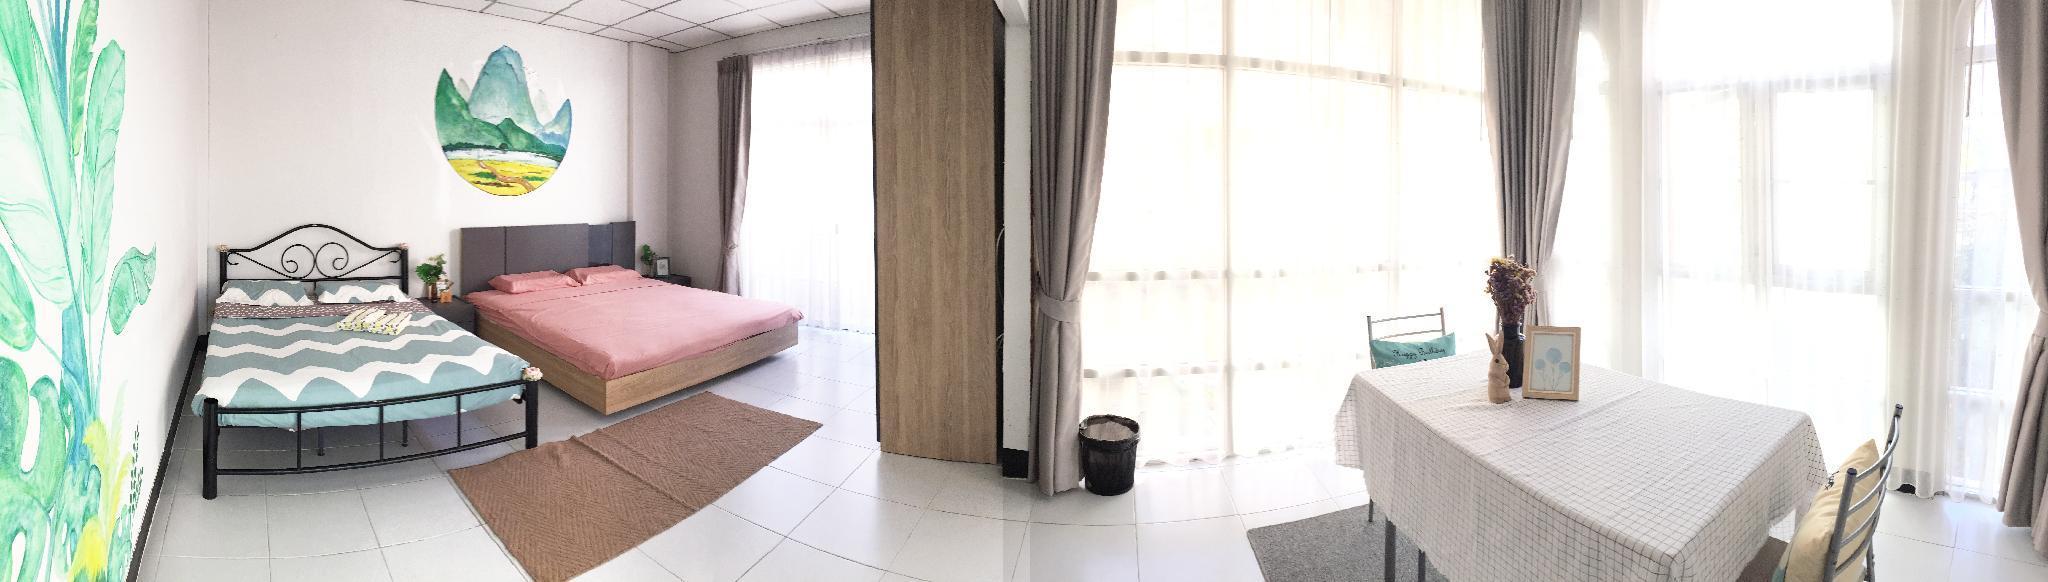 Big Family Room 6 Ppl Near Chang Khlan Nightmarket